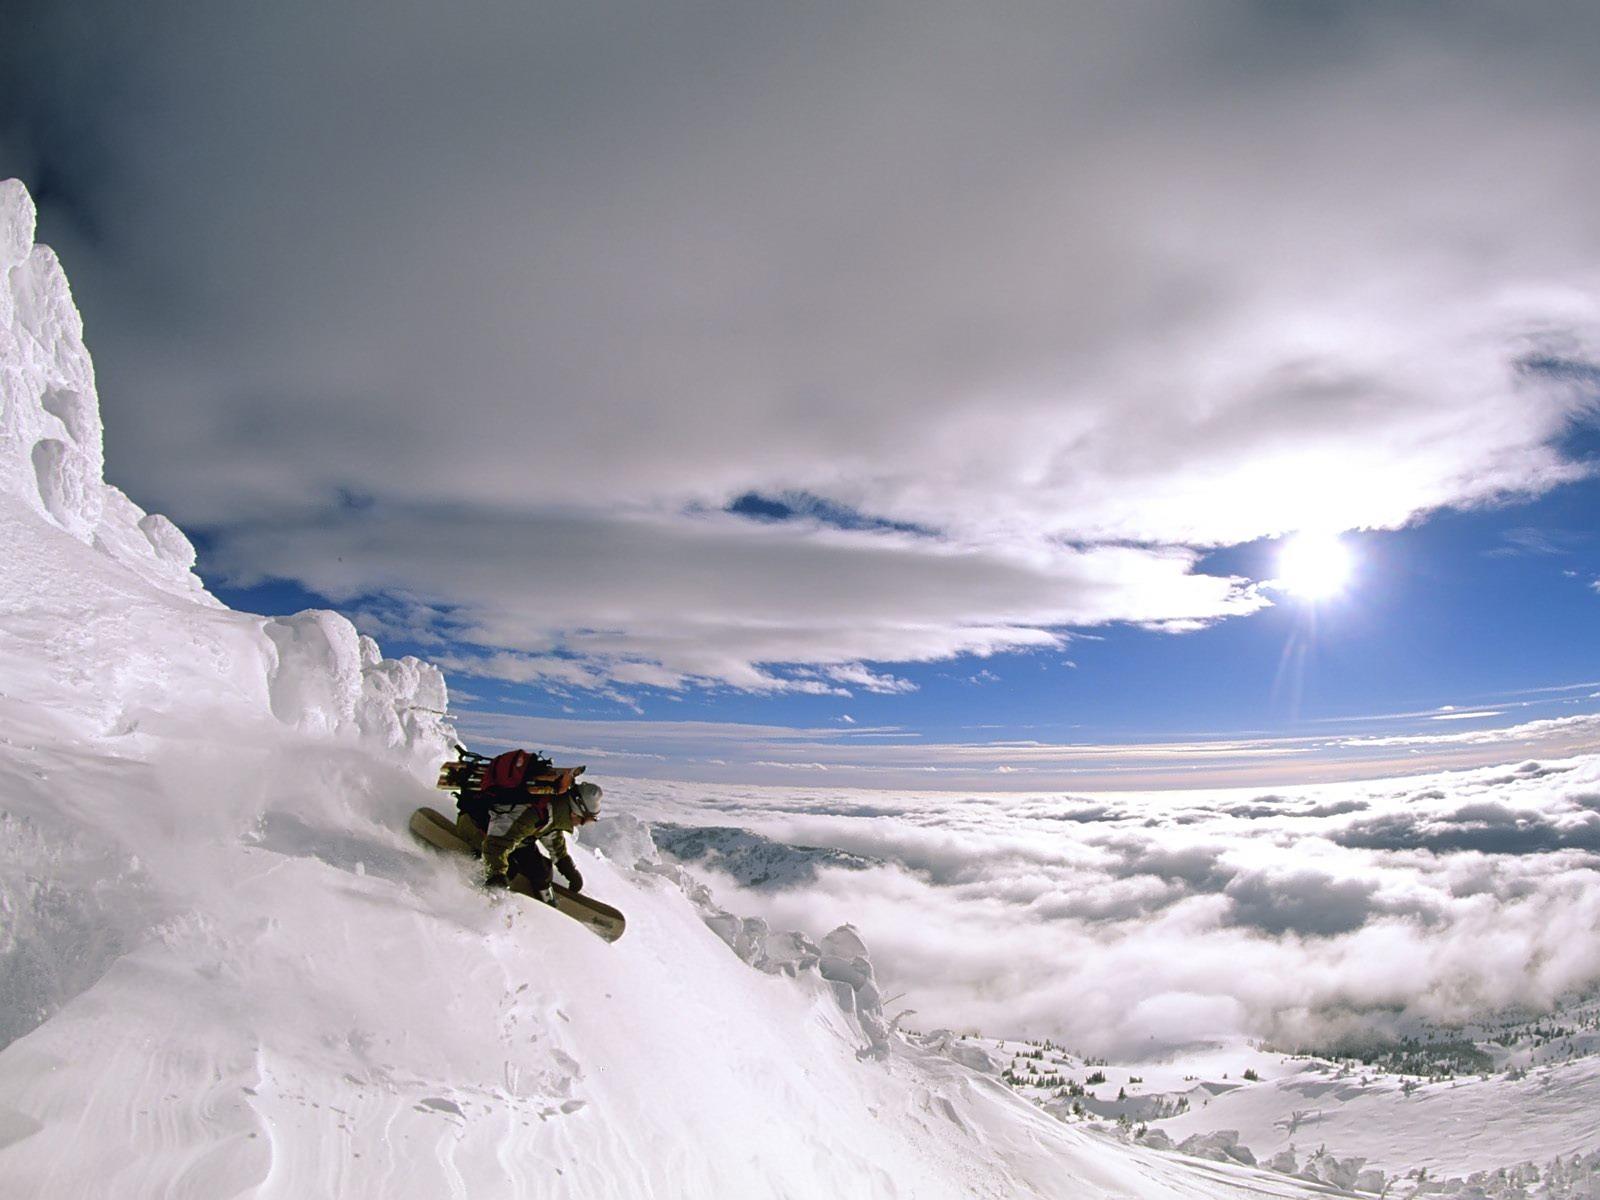 snowboard wallpaper snowboarding sports wallpapers in jpg format for